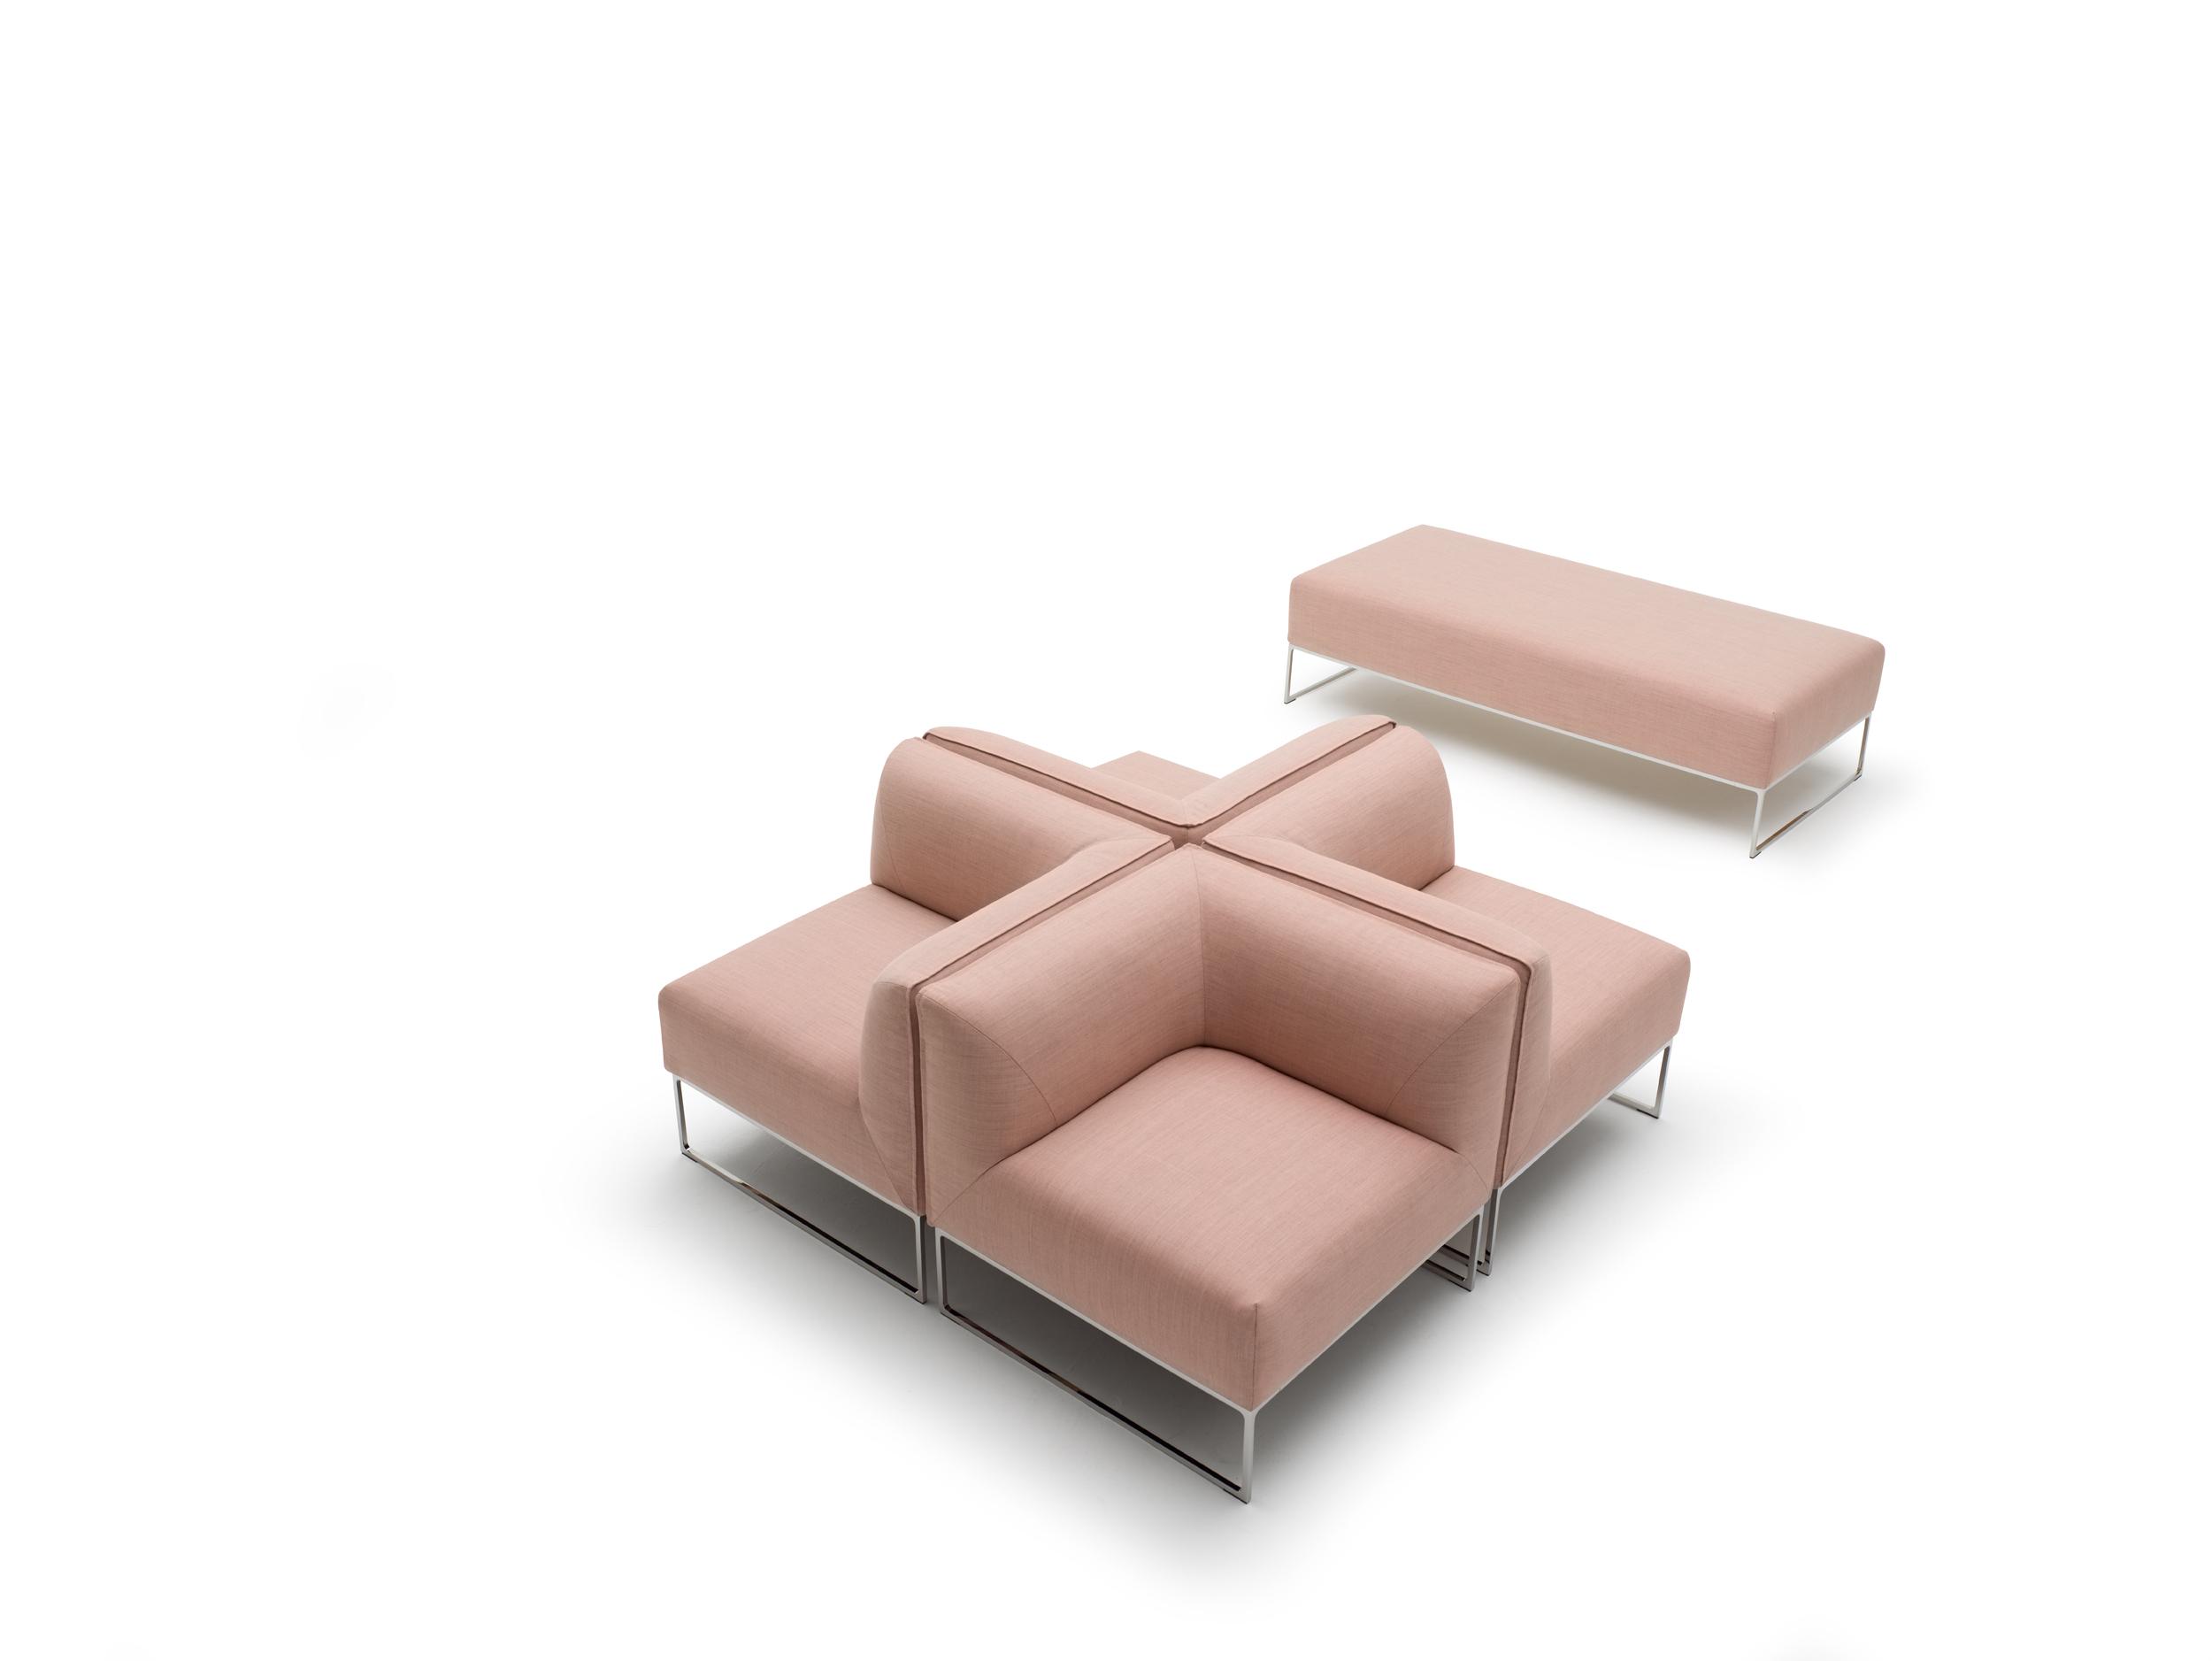 mell sofa professional cor. Black Bedroom Furniture Sets. Home Design Ideas